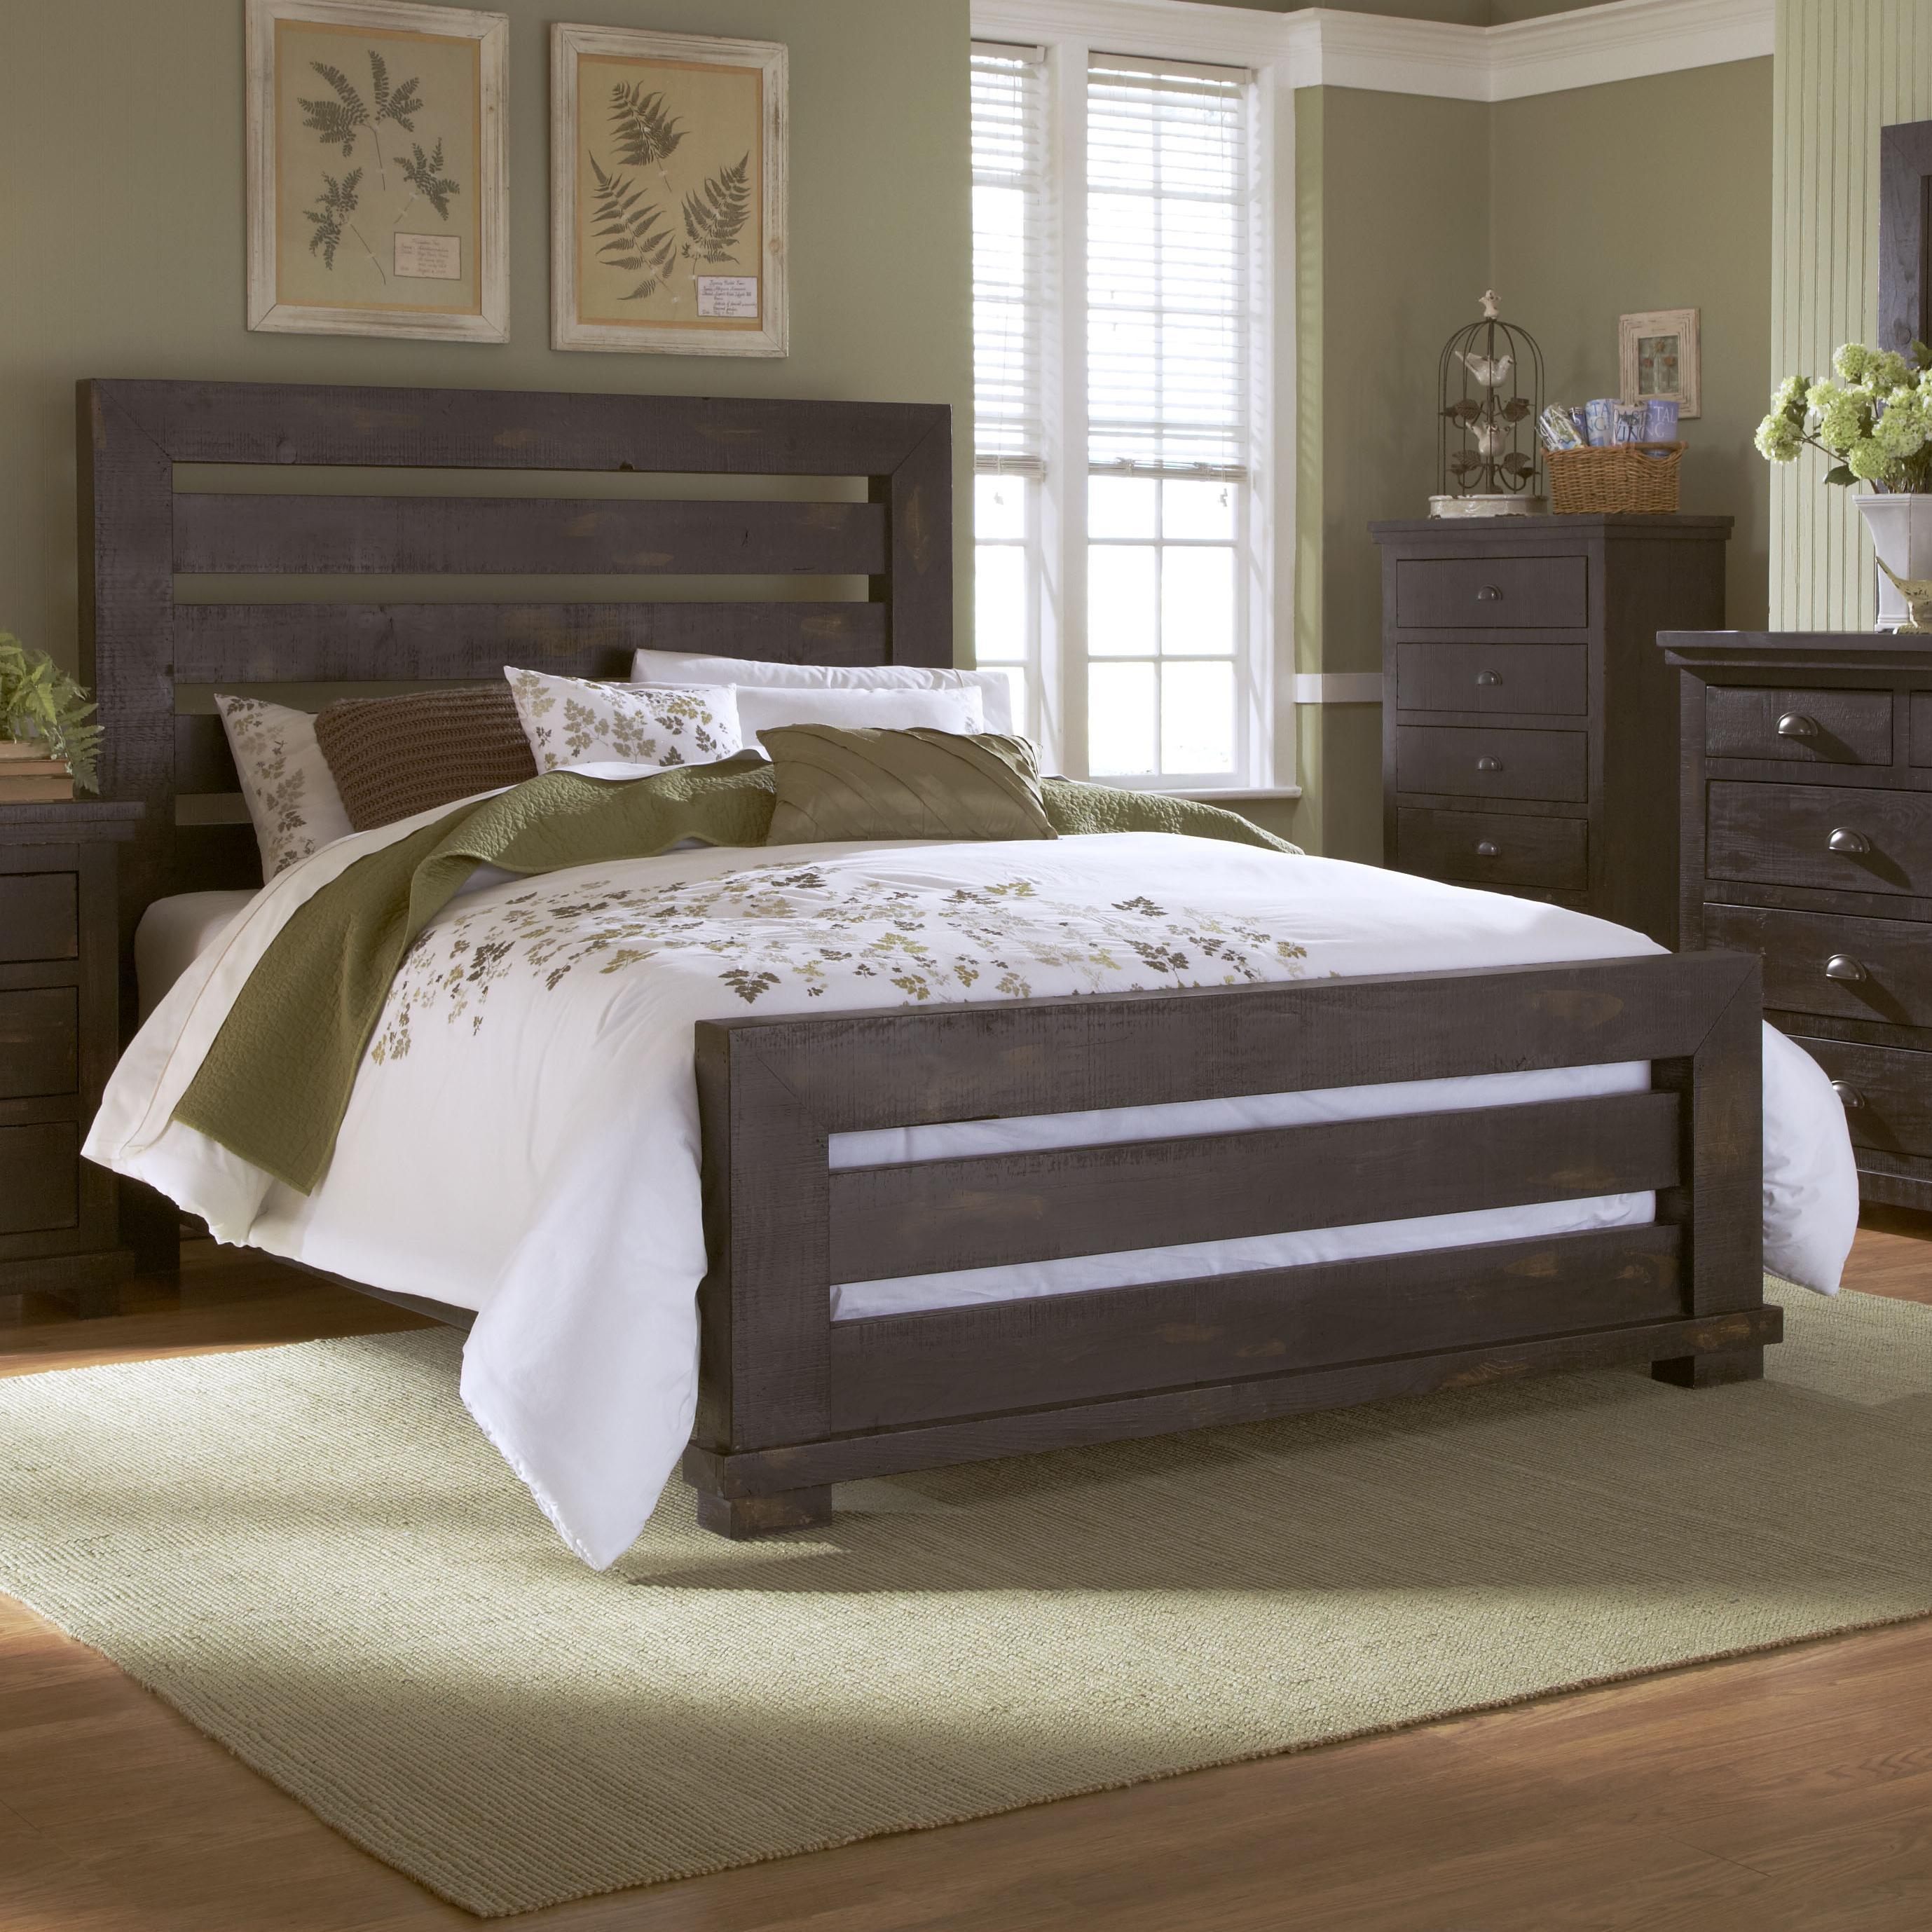 King Size Slat Bed Frame Retail Price Super King Slat Bed